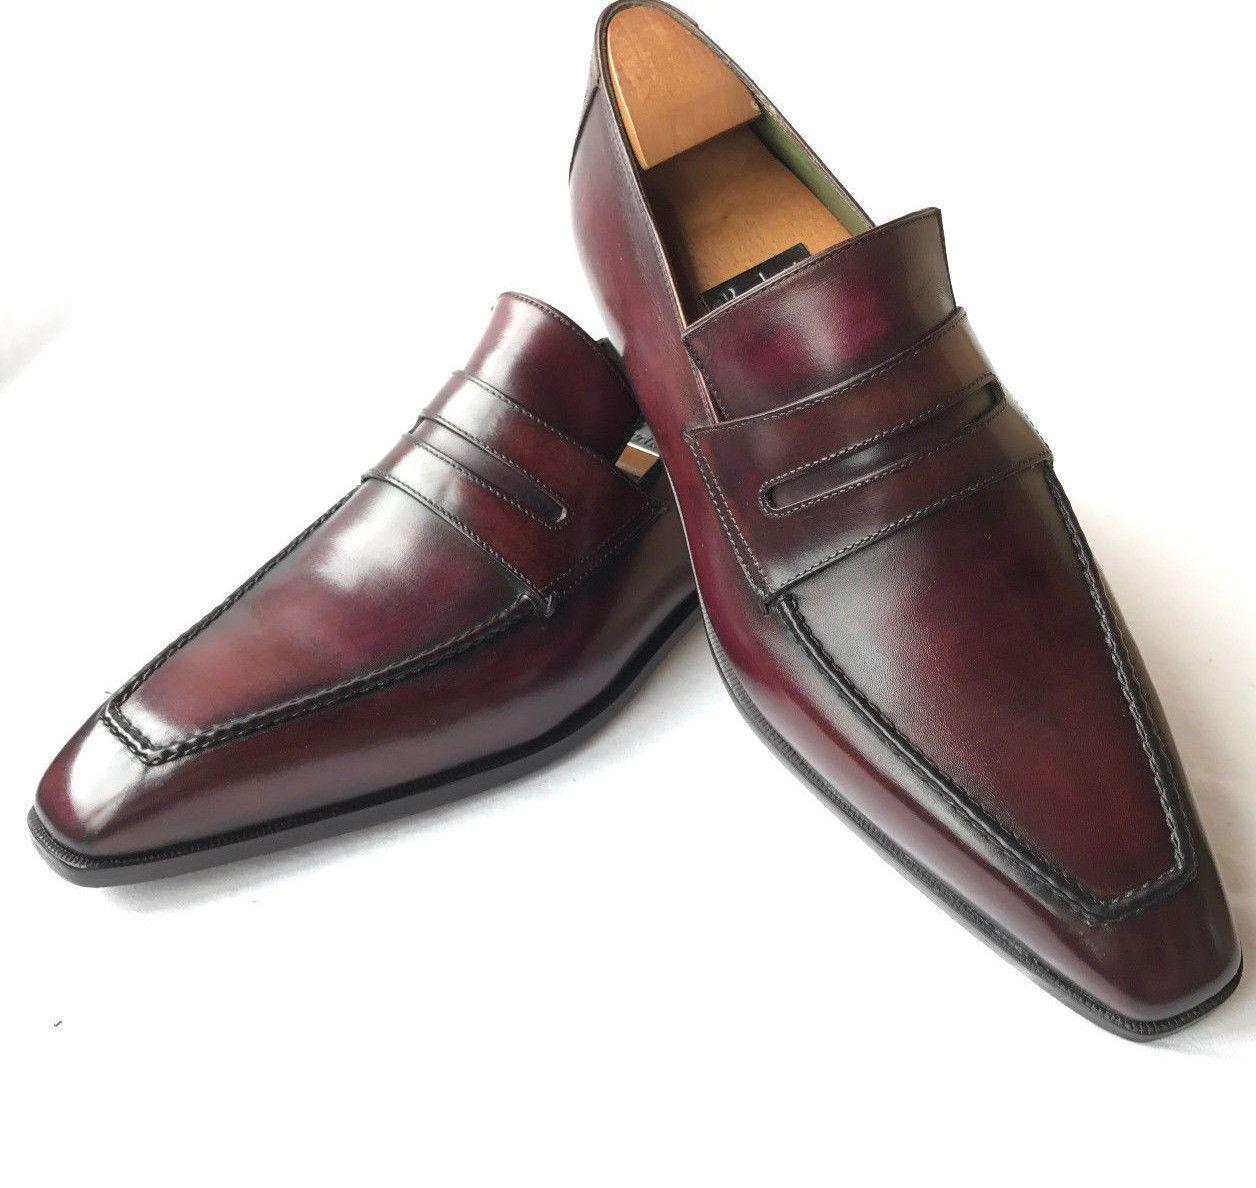 Handmade Men Dark Burgundy Leather Shoes Formal Leather Shoes For Leather Shoes Men Dress Shoes Men Leather Formal Shoes